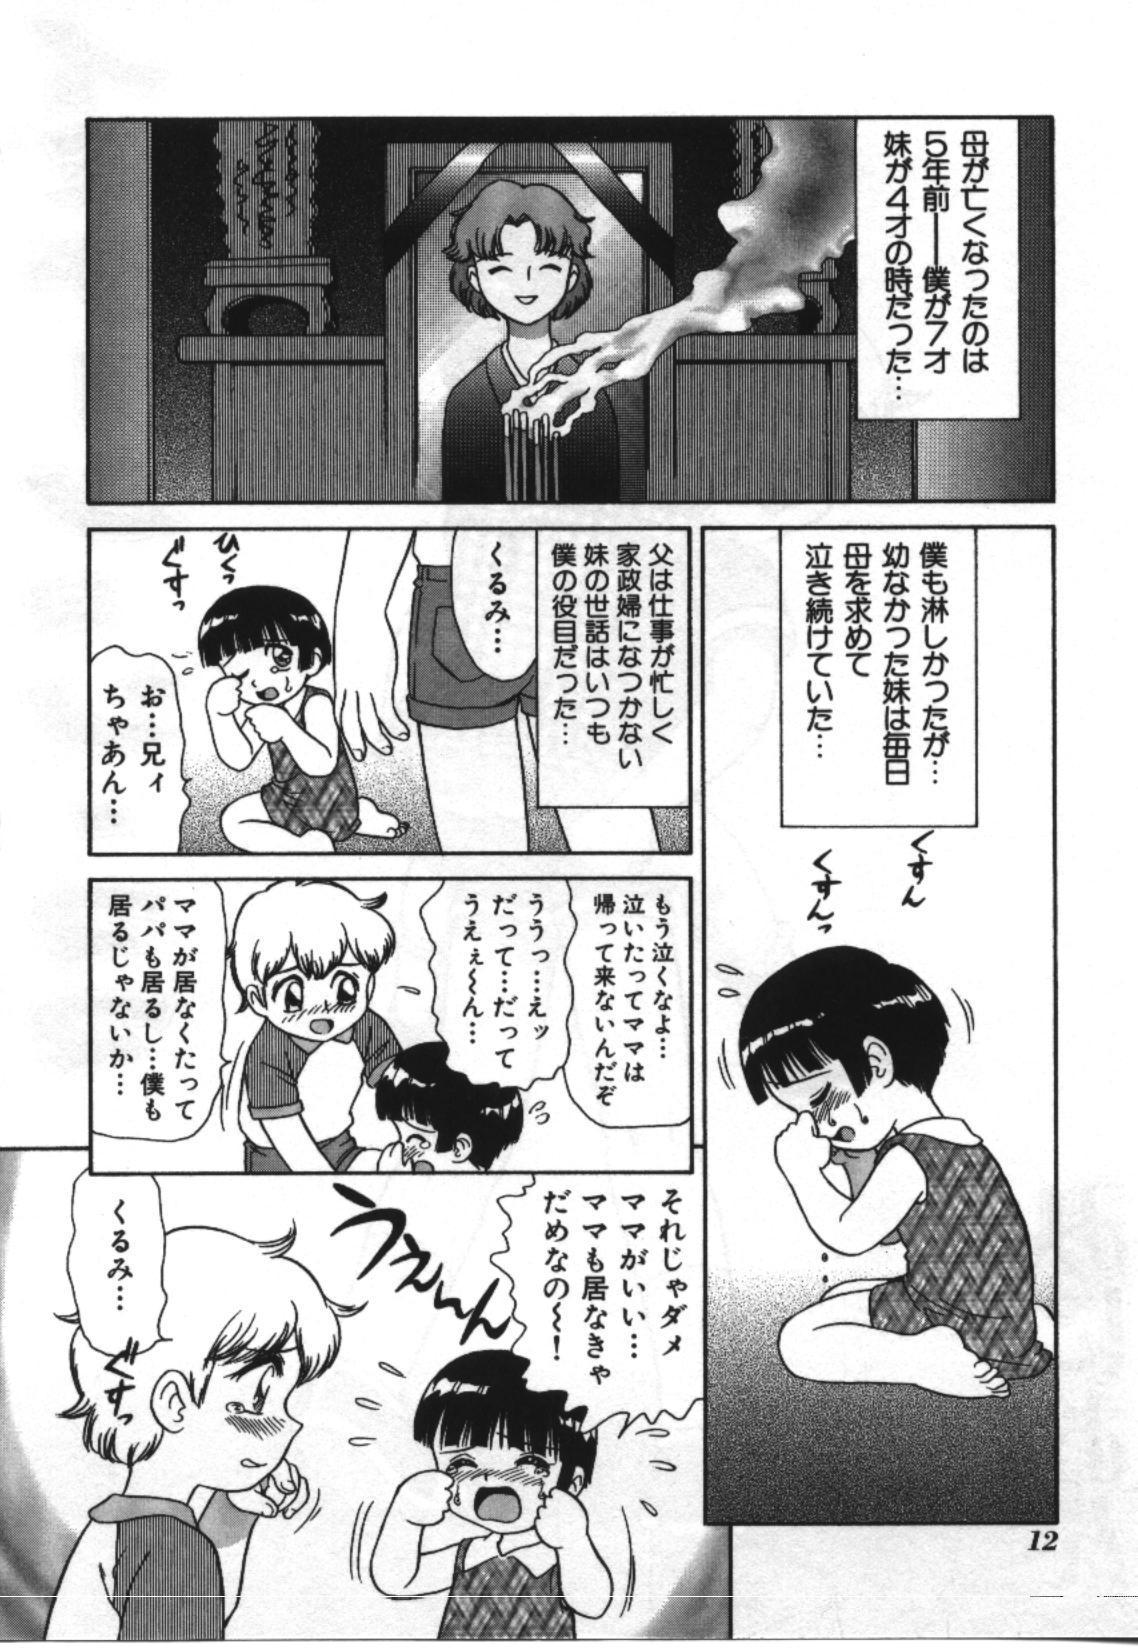 Imouto Koishi 2 11